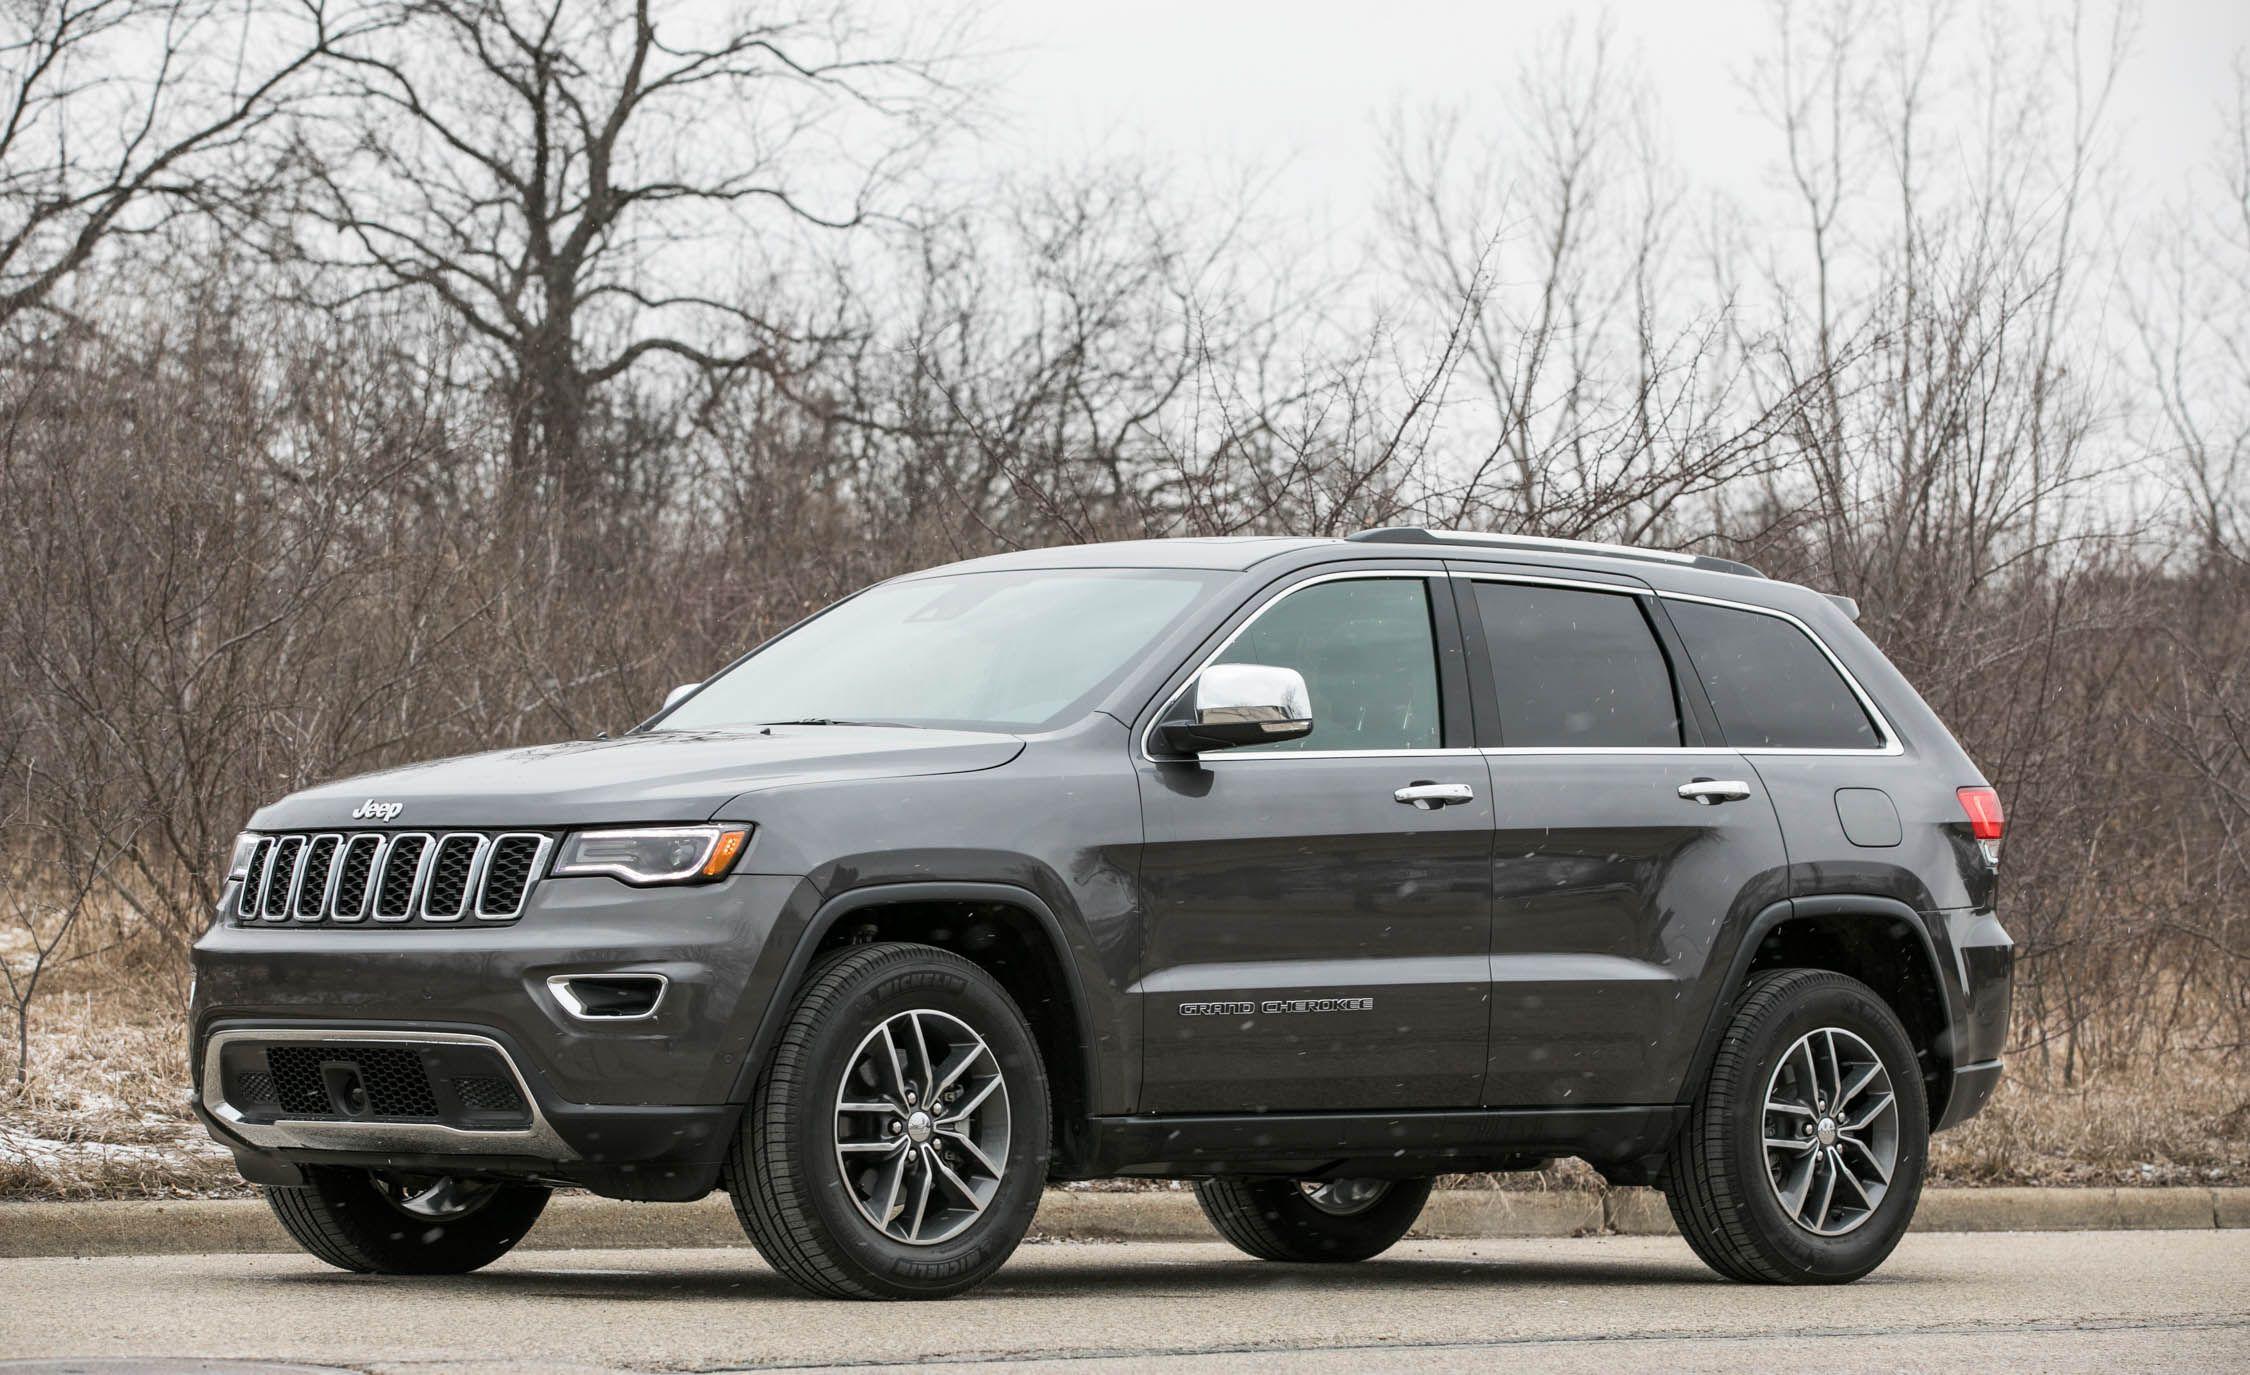 2018 jeep grand cherokee exterior review car and driver rh caranddriver com